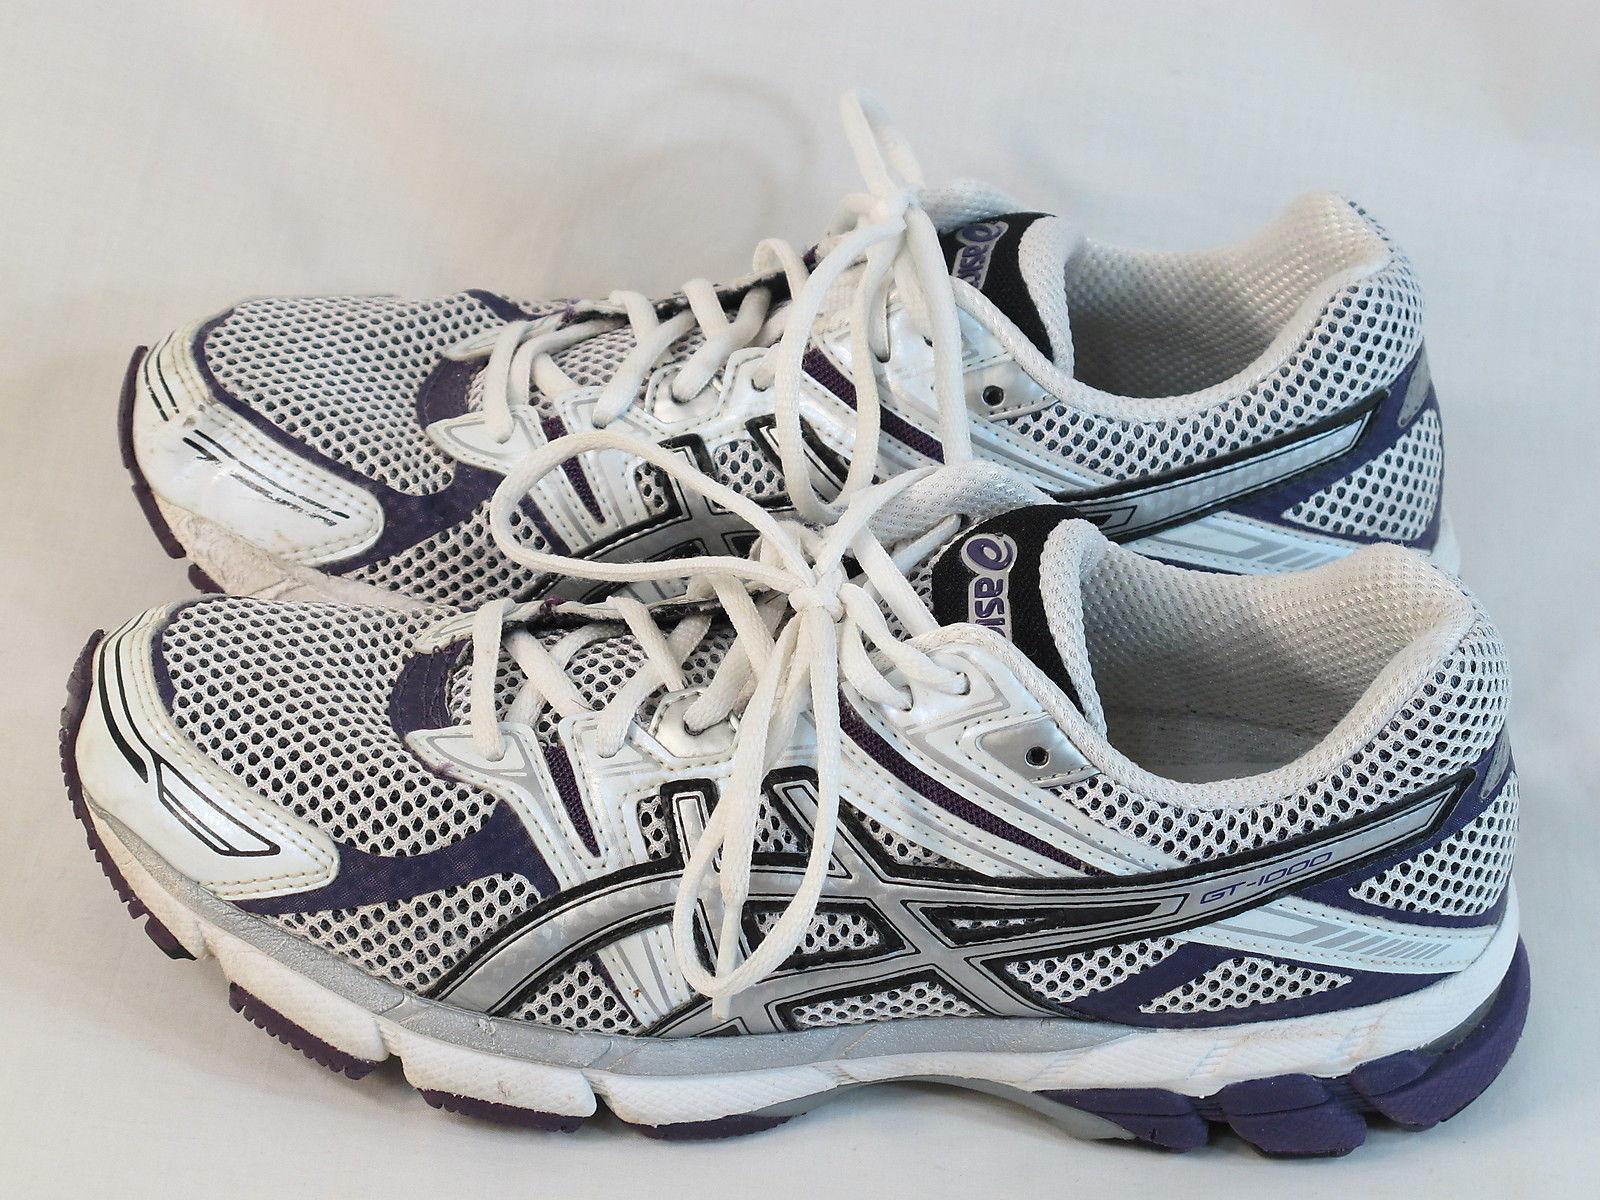 ASICS GT-1000 Running Shoes Women's Size 8.5 US Excellent Plus Condition